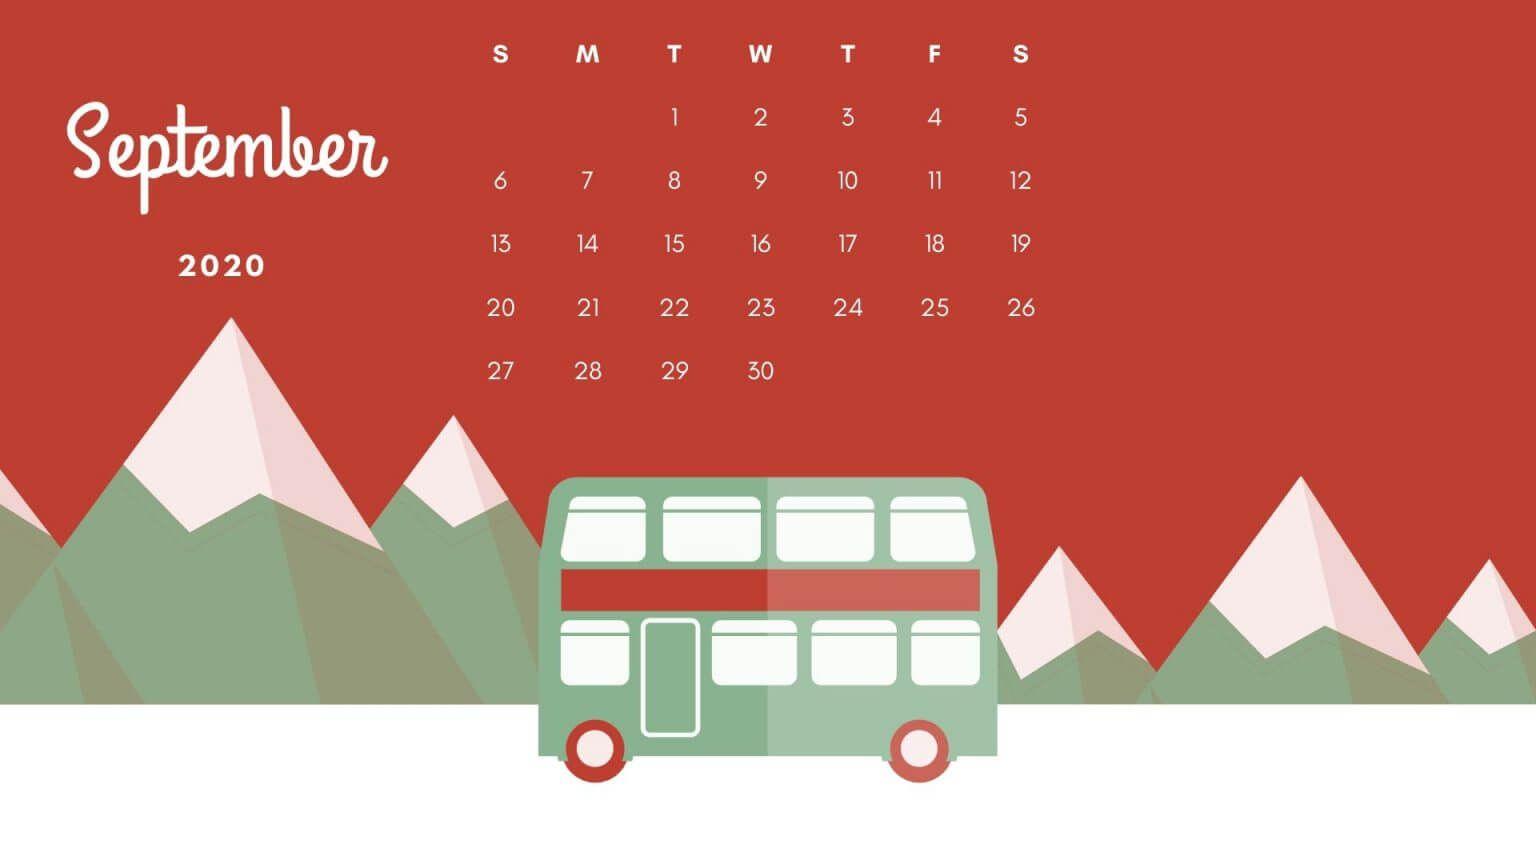 September 2020 Best Calendar In 2020 Calendar Wallpaper September Calendar Wall Calendar